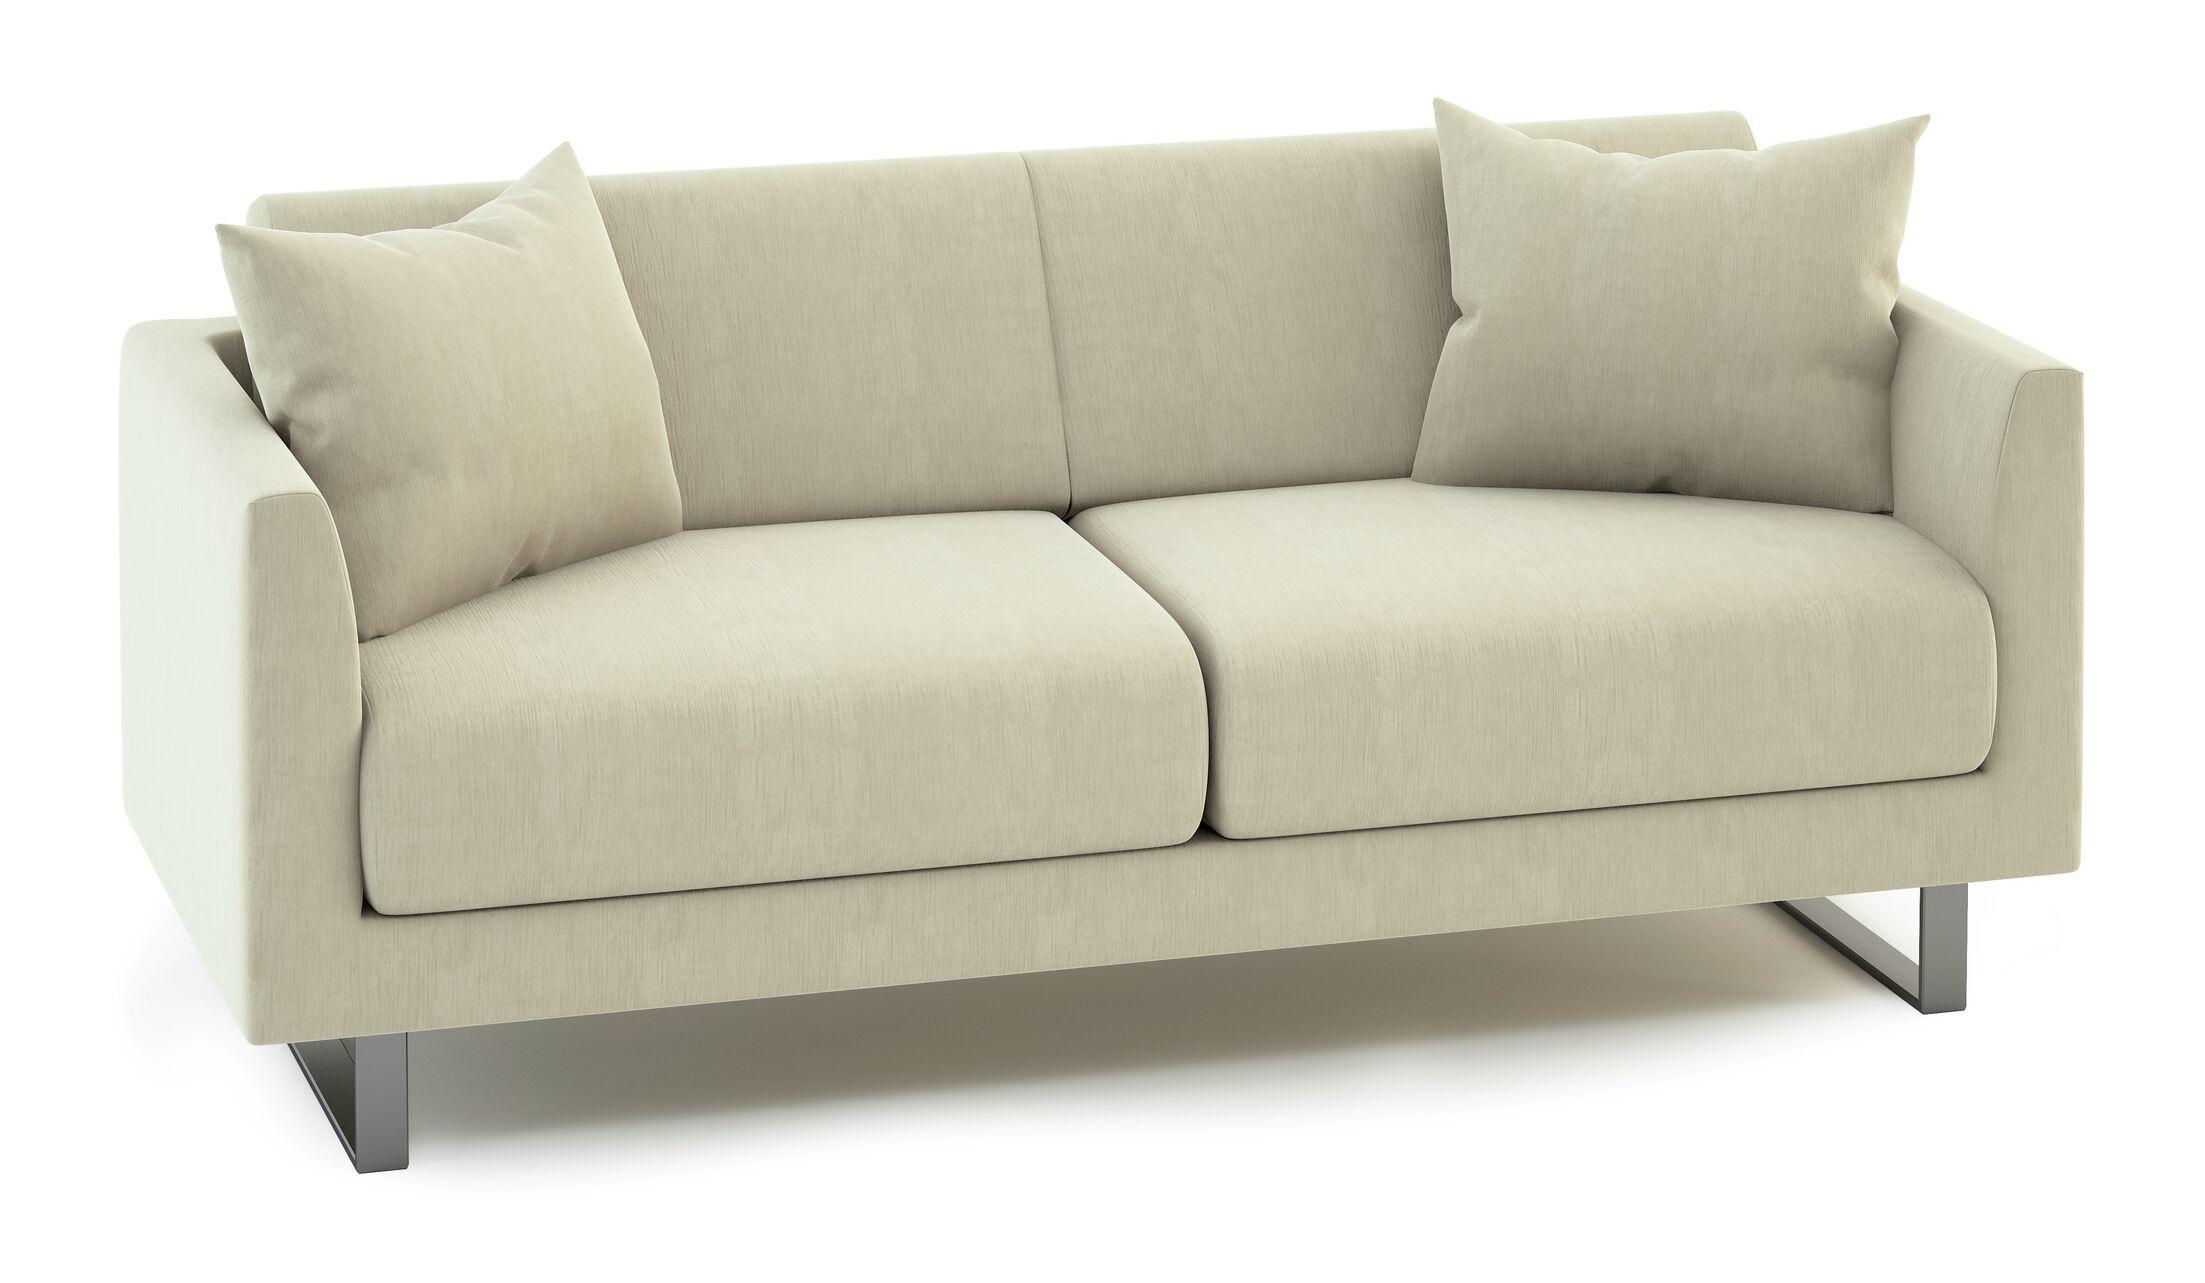 Fizz Mellini Urban Patio Sofa Fabric Color: Canvas Air Blue